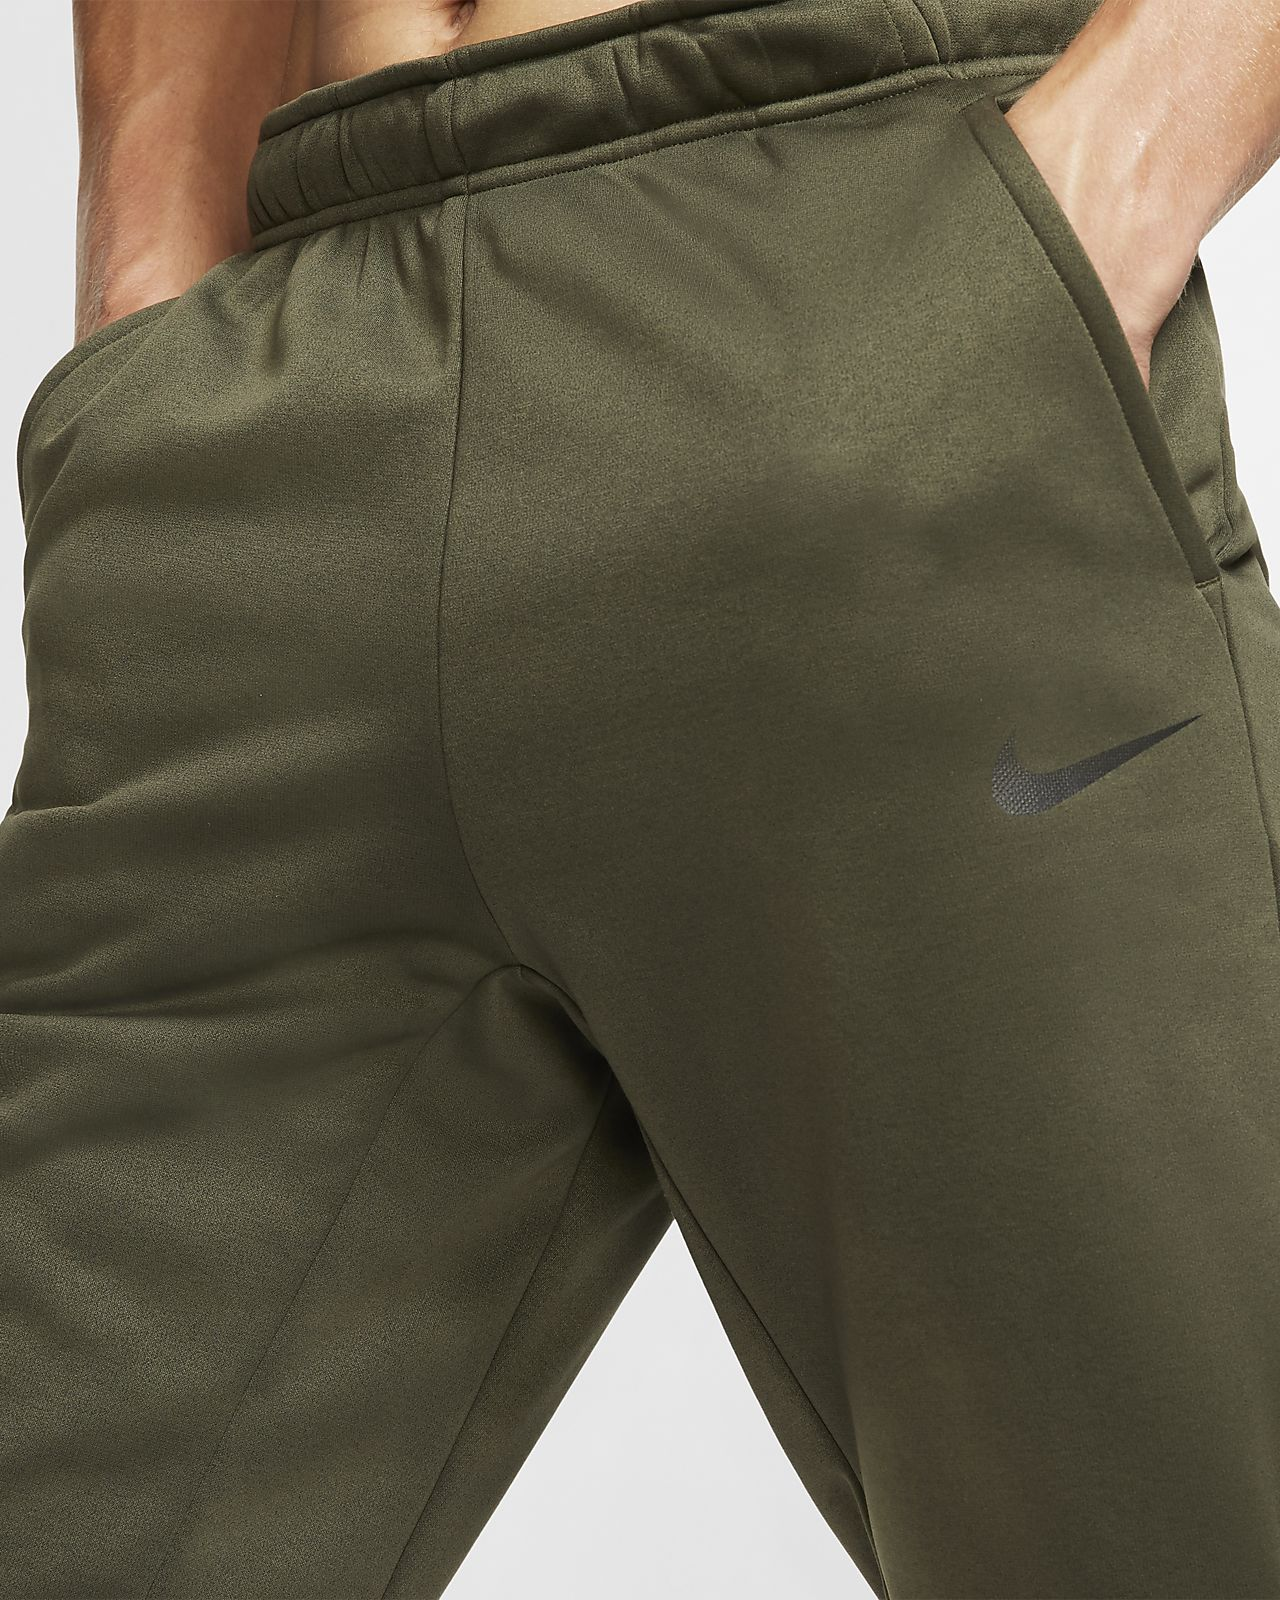 Homme Pantalon Training Nike Pour De Fuselé Therma NnOkZwP80X